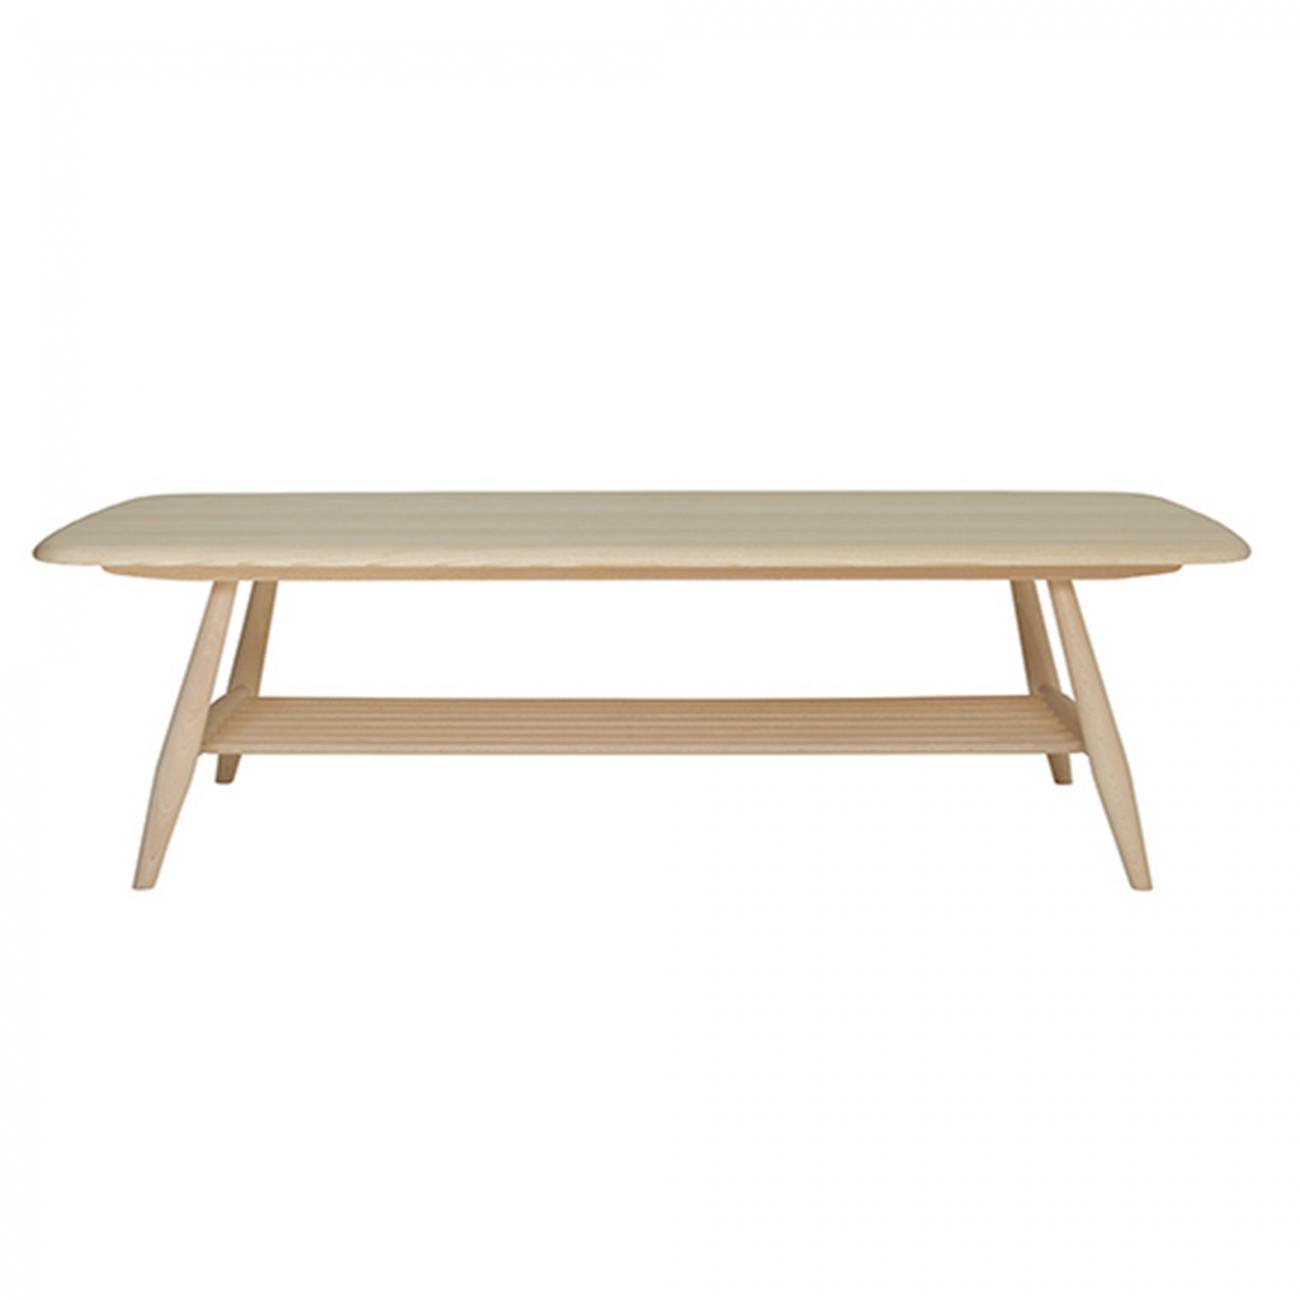 Ercol Utility coffee table